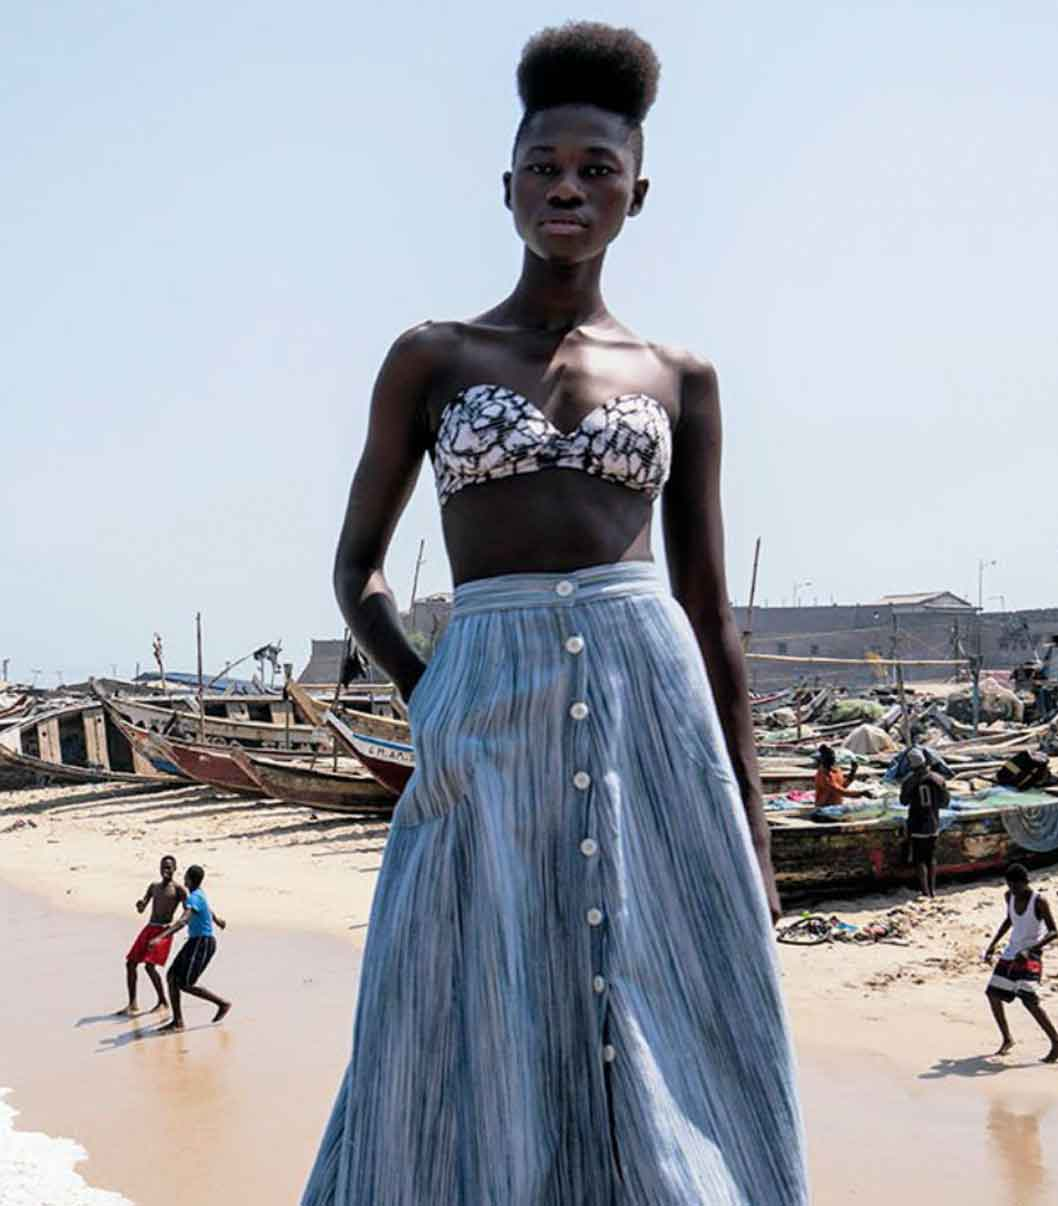 STUDIO 189 sutsianble fair clothing label Africa good fashion guide ECOLOOKBOOK